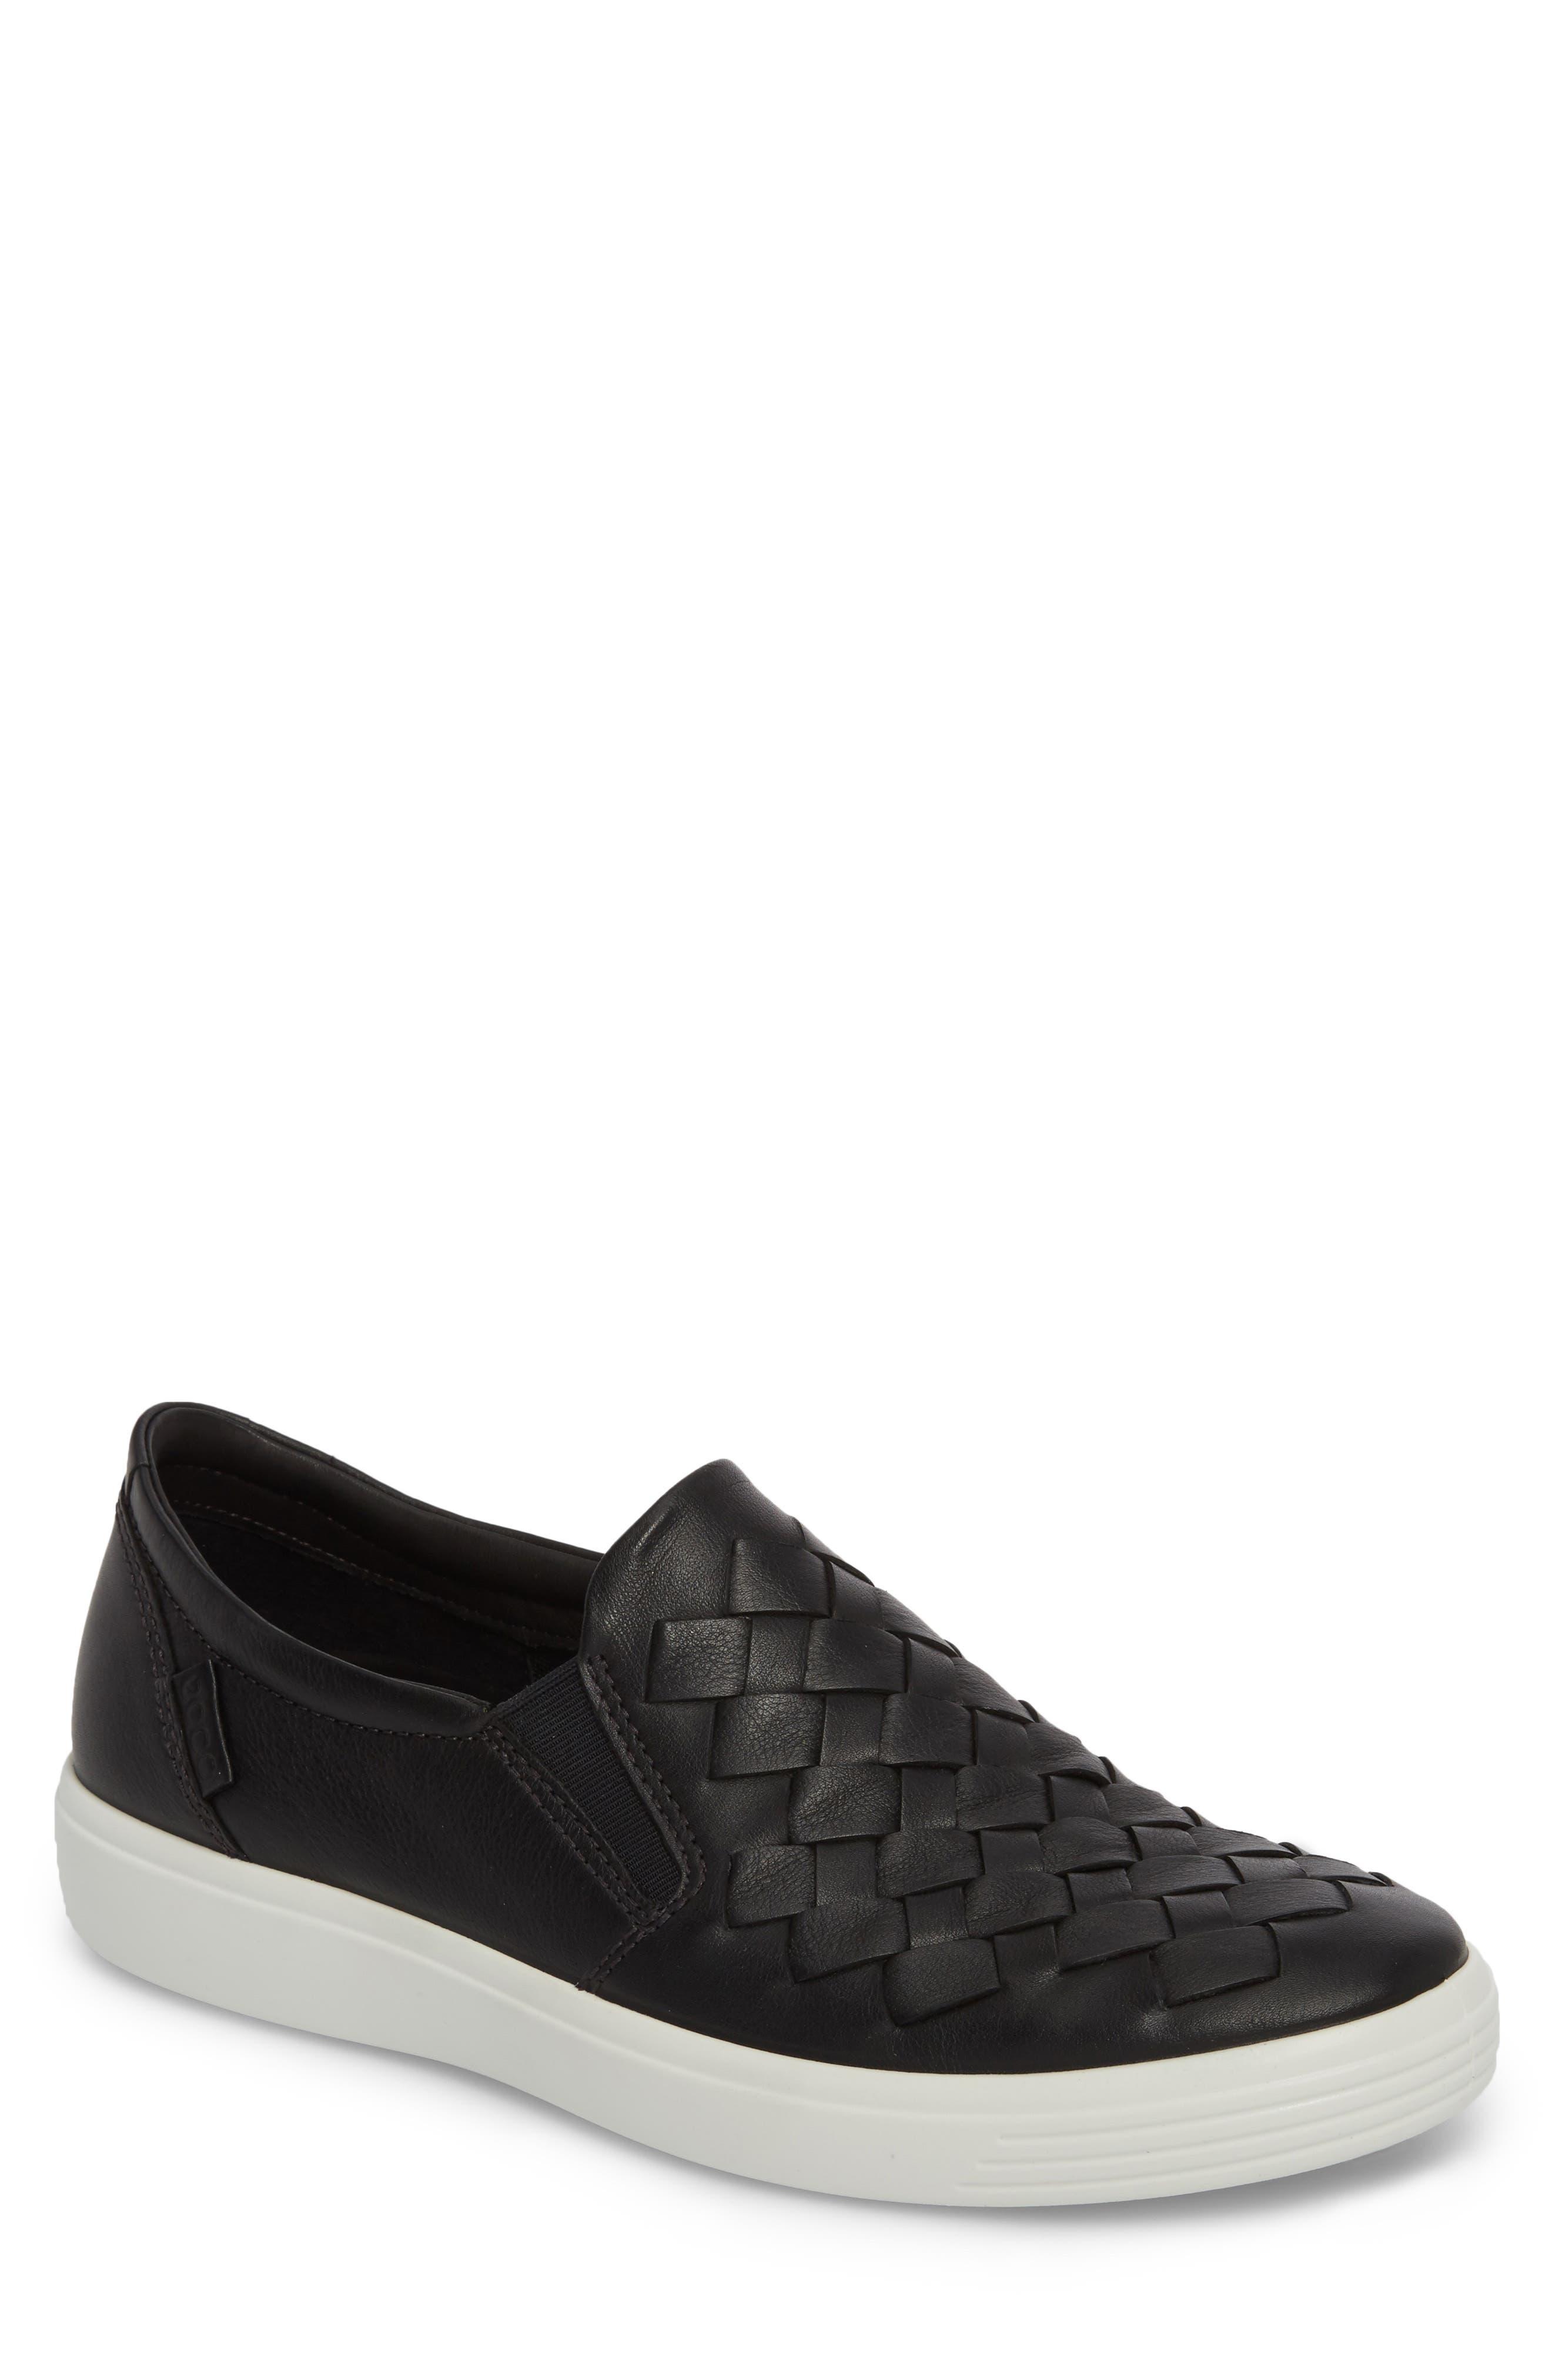 Soft 7 Woven Slip-On Sneaker,                             Main thumbnail 1, color,                             BLACK LEATHER